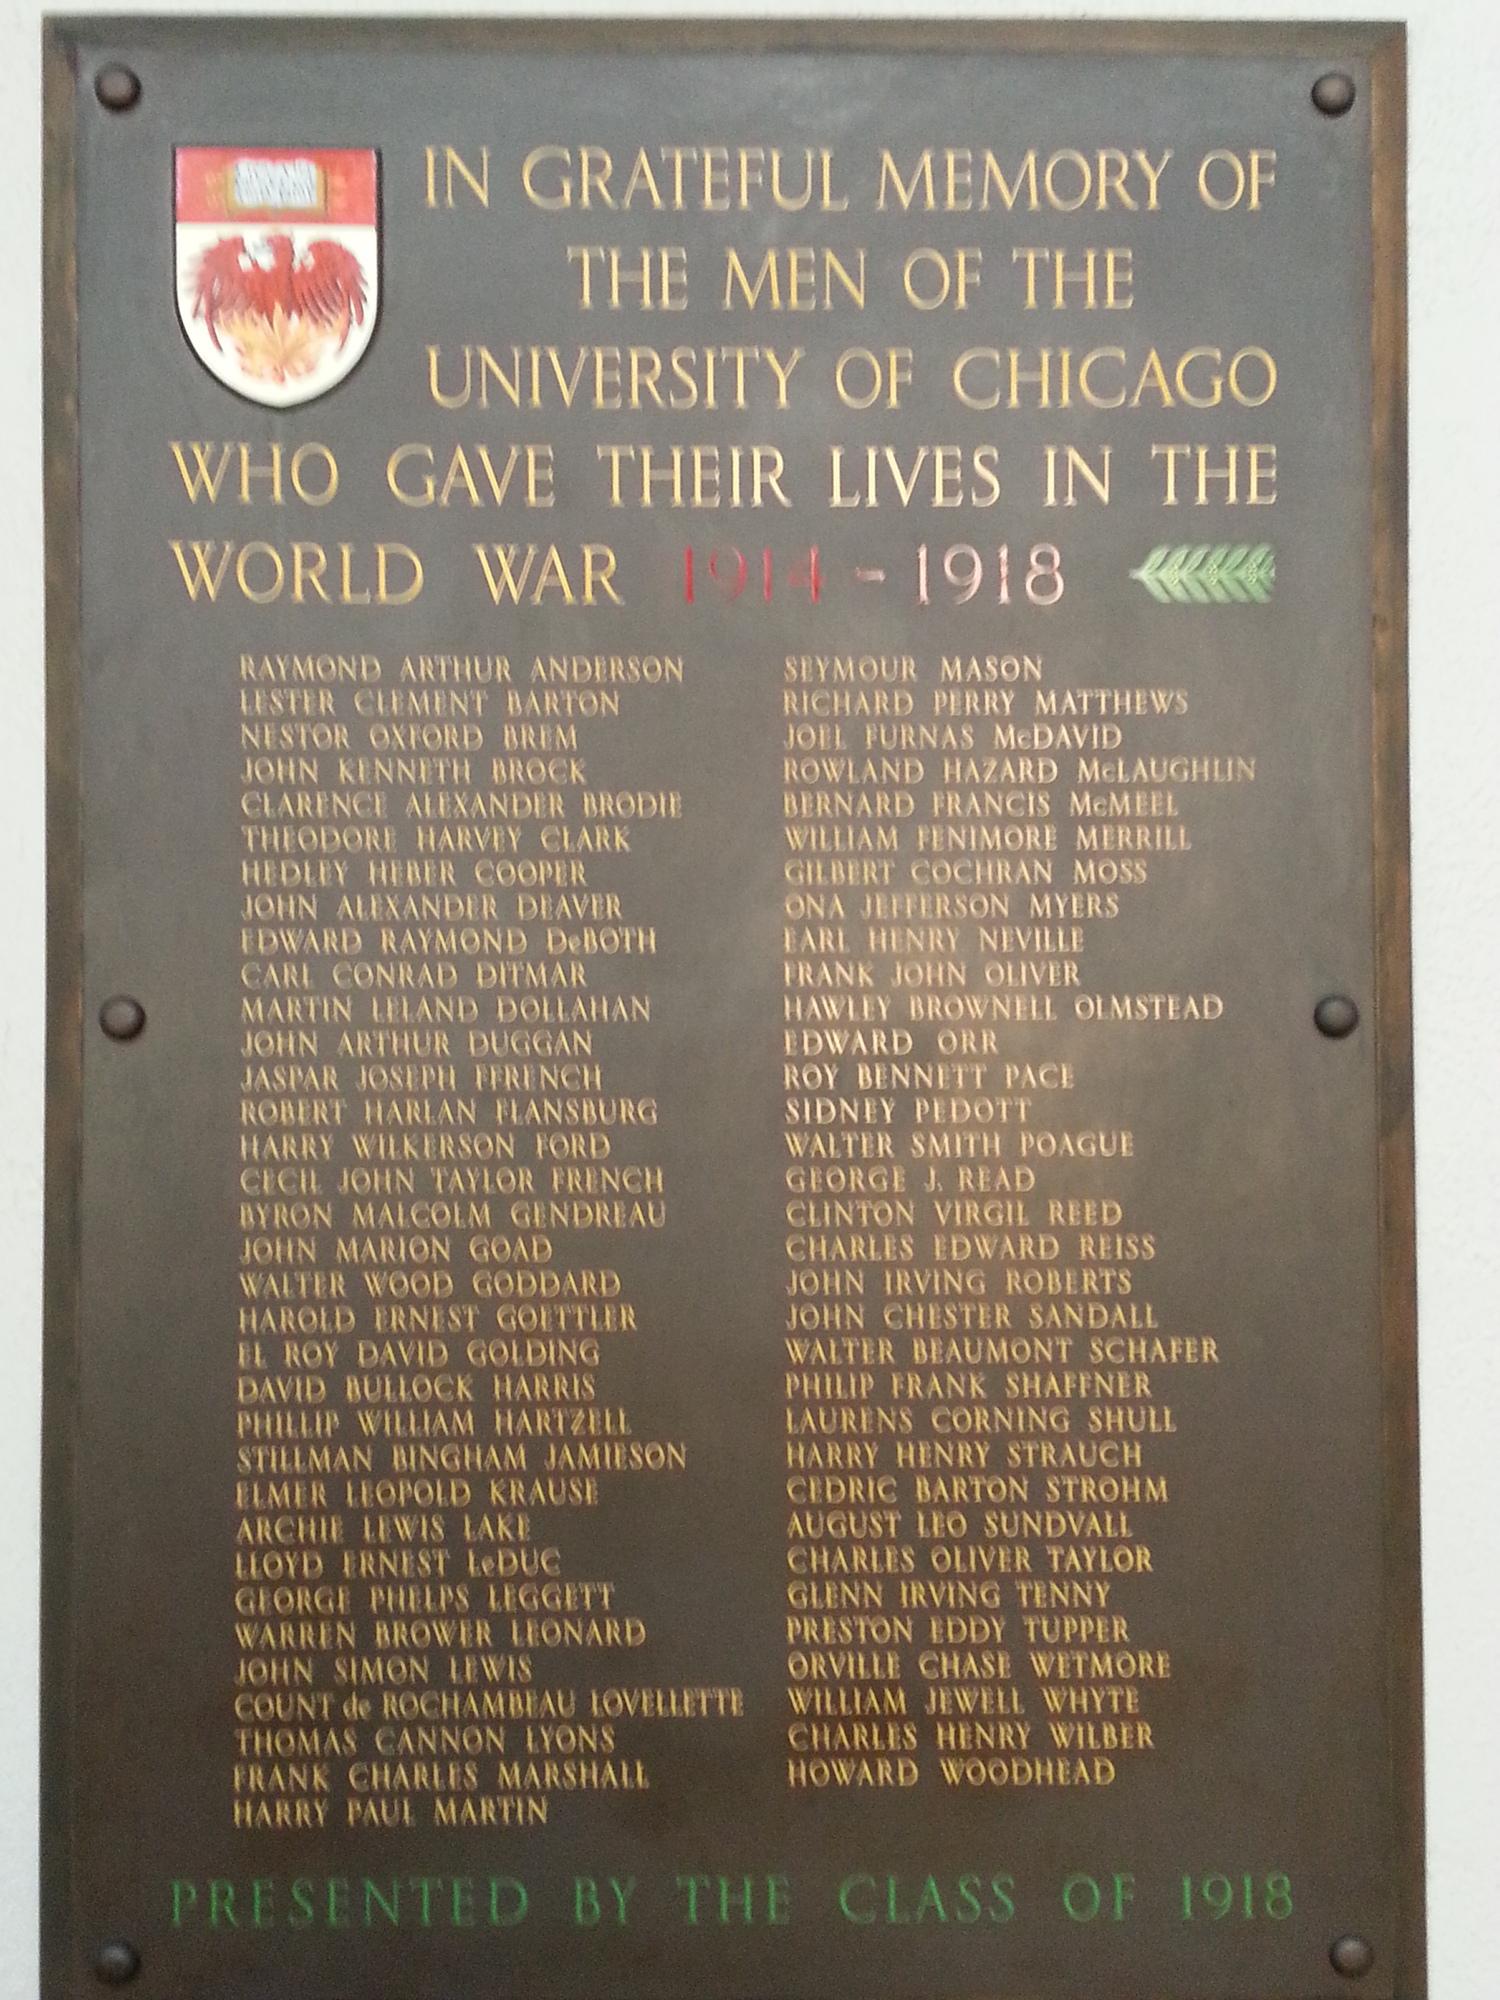 University of Chicago World War Memorial Plaque (IL)